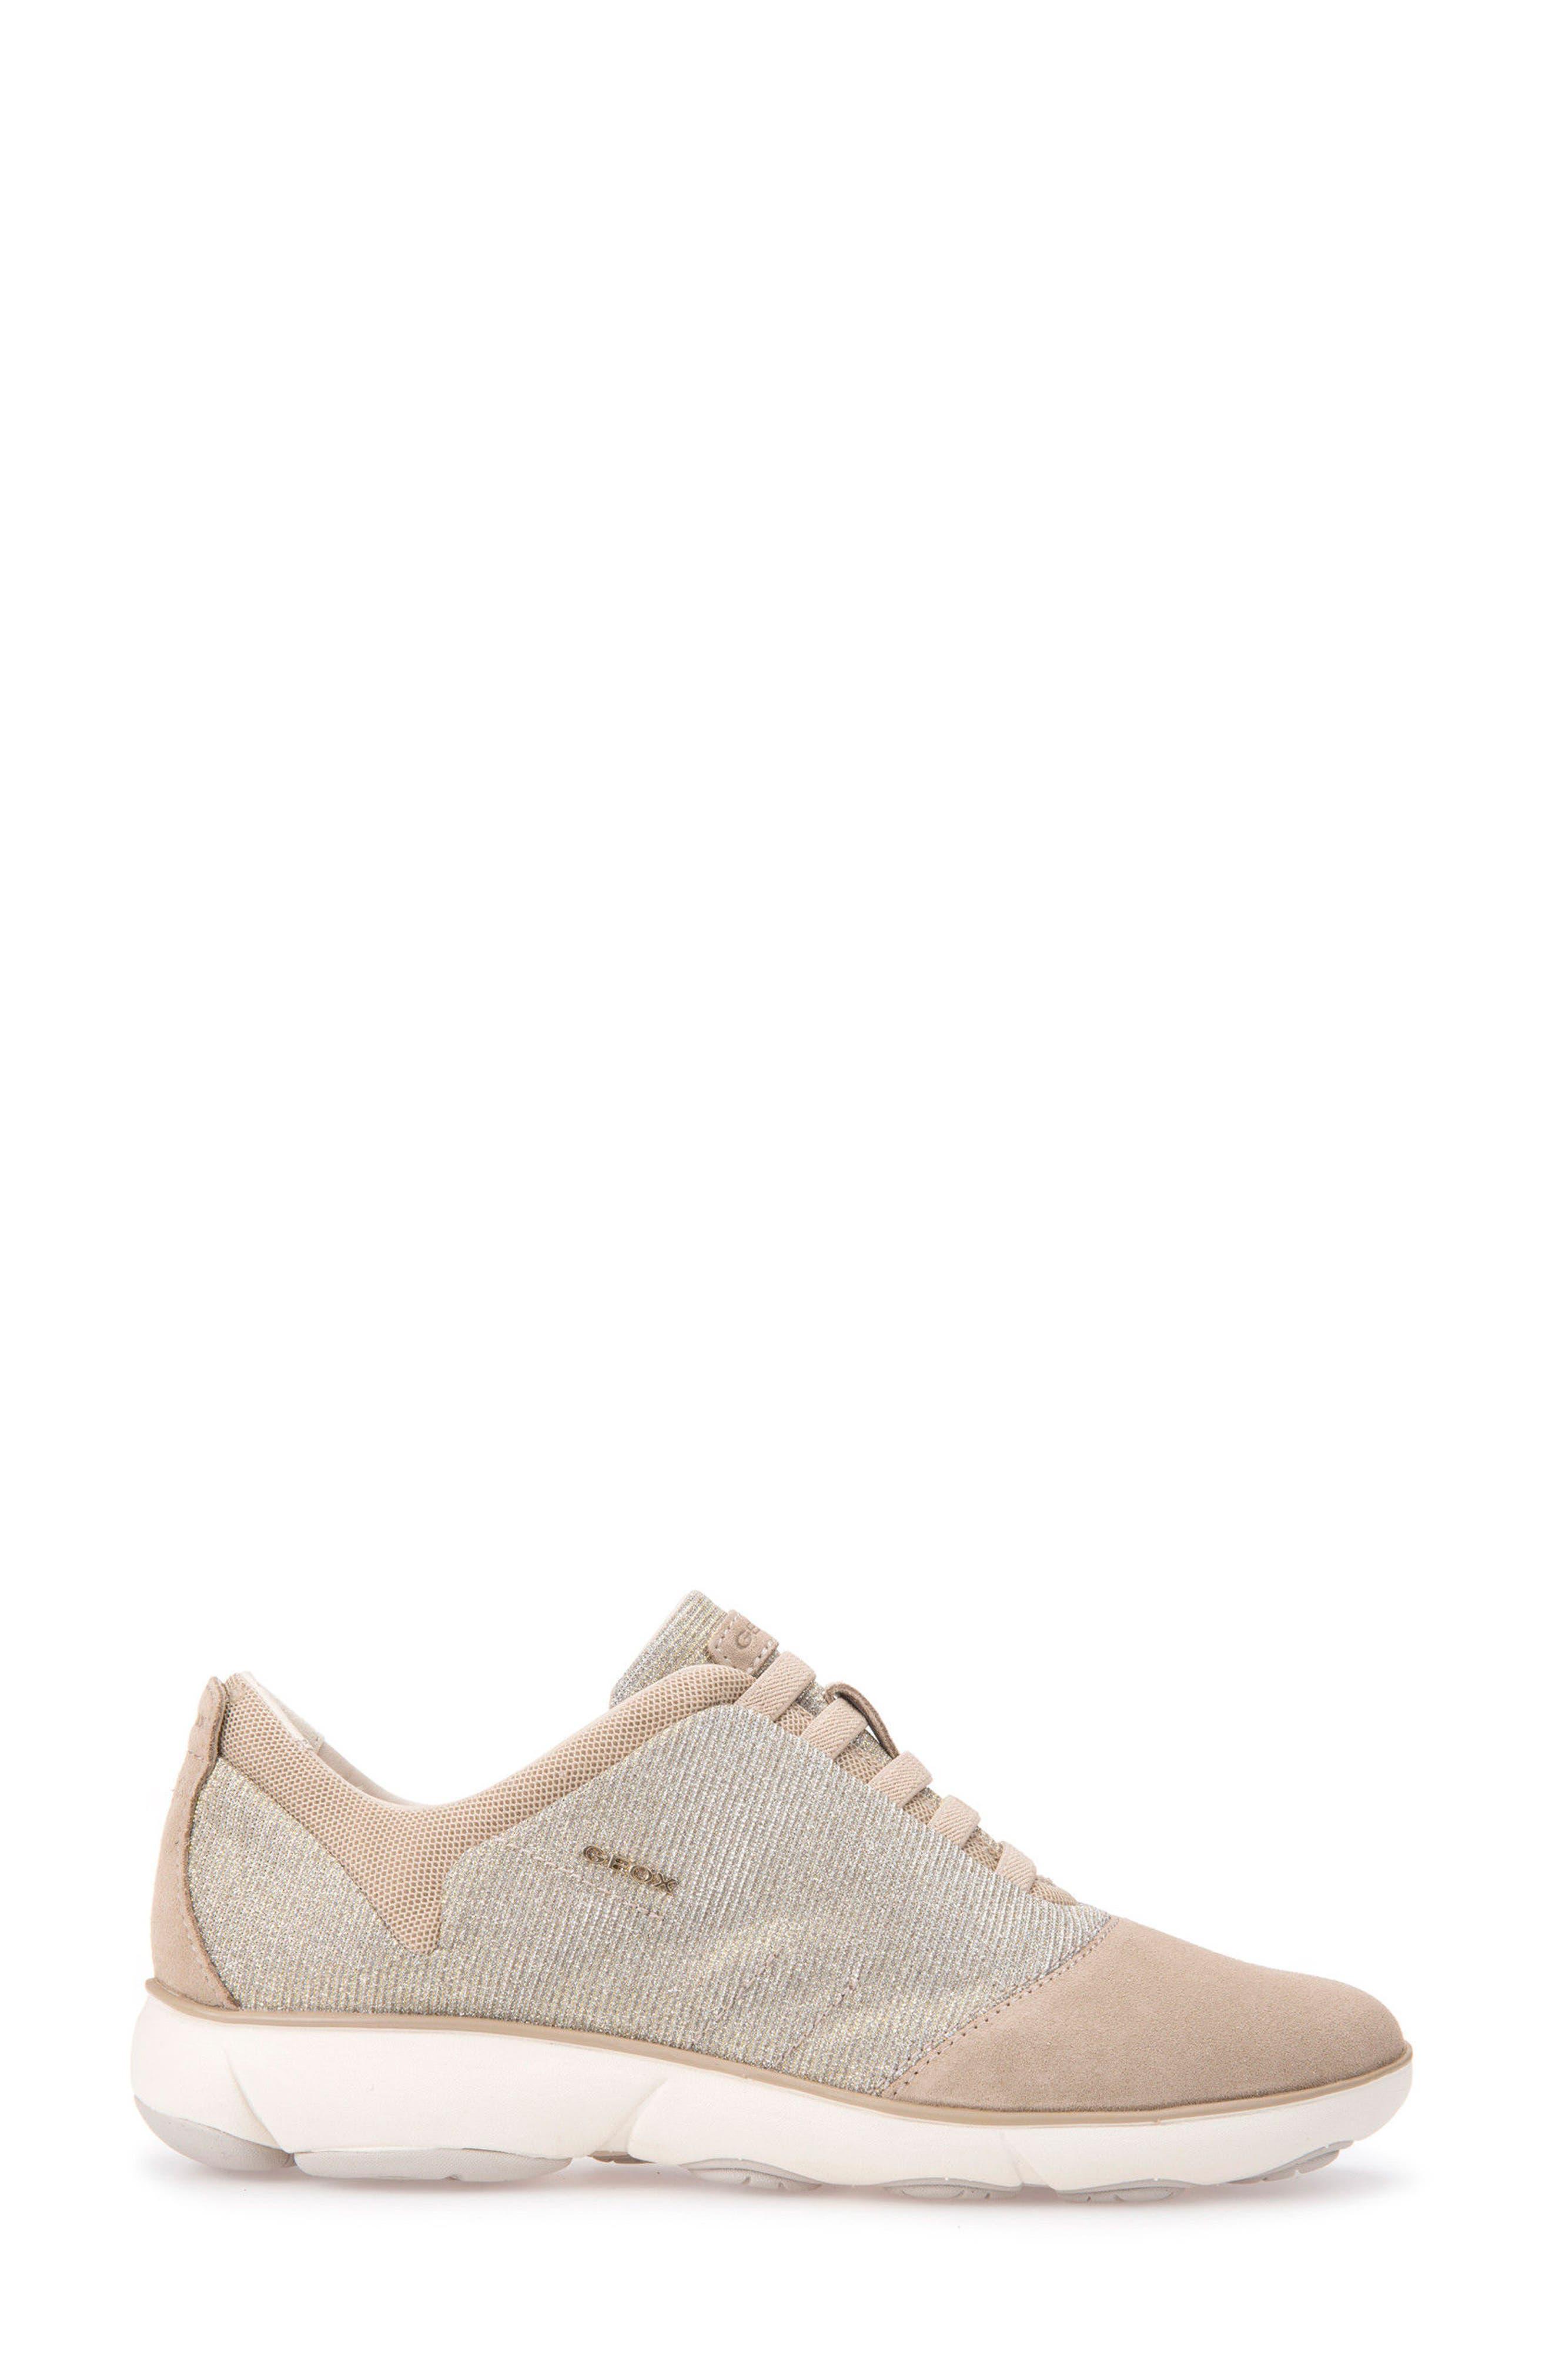 Nebula Slip-On Sneaker,                             Alternate thumbnail 3, color,                             Taupe Fabric